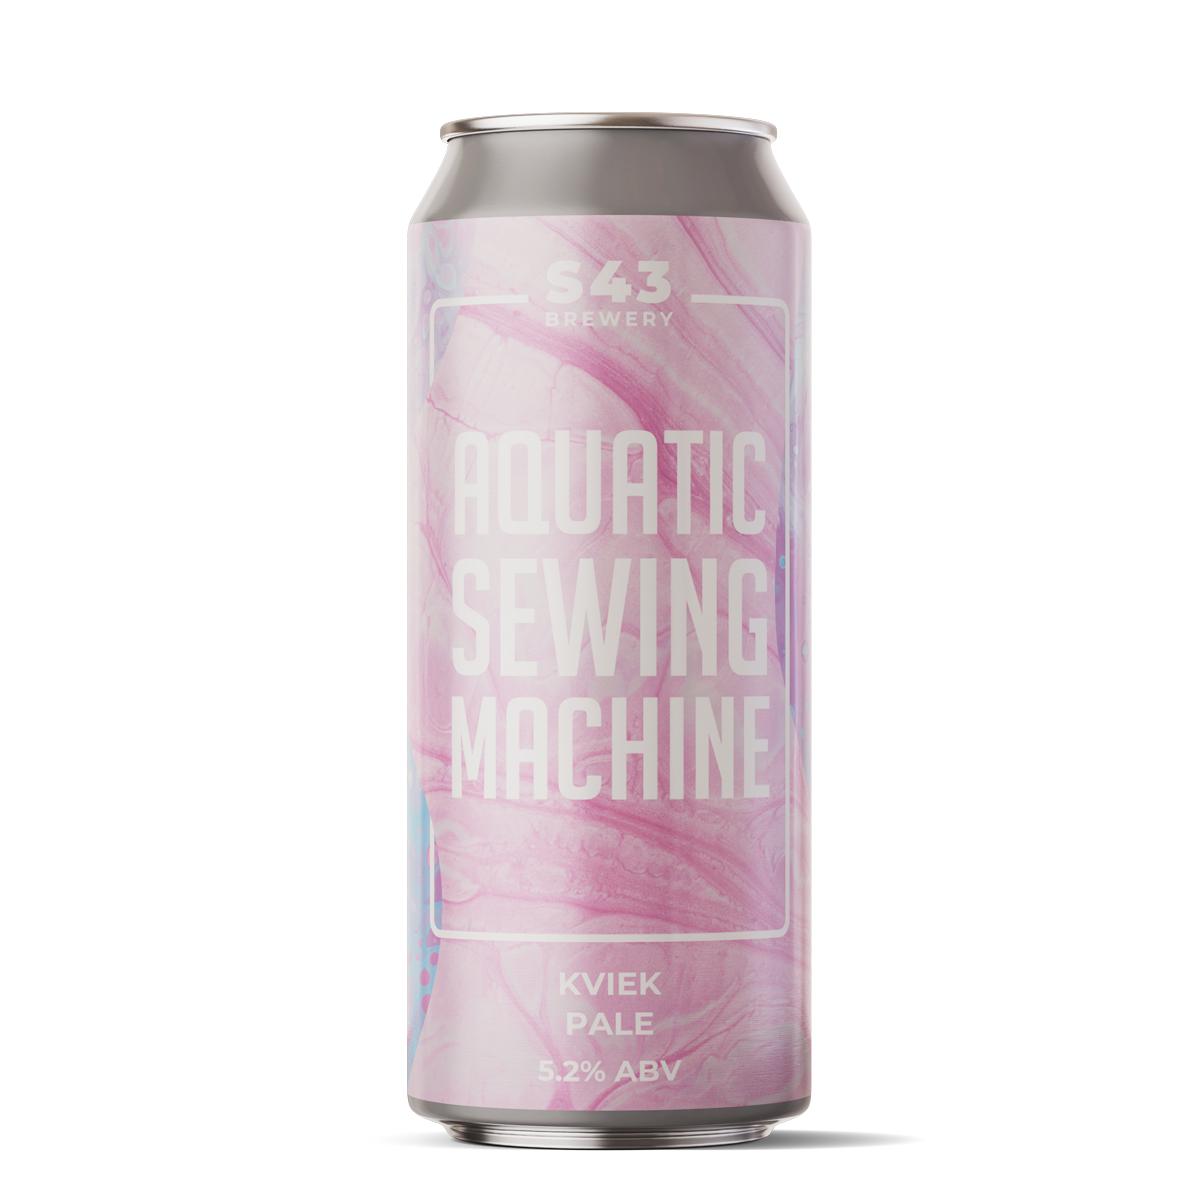 Aquatic_Sewing_Machine_Product_Image